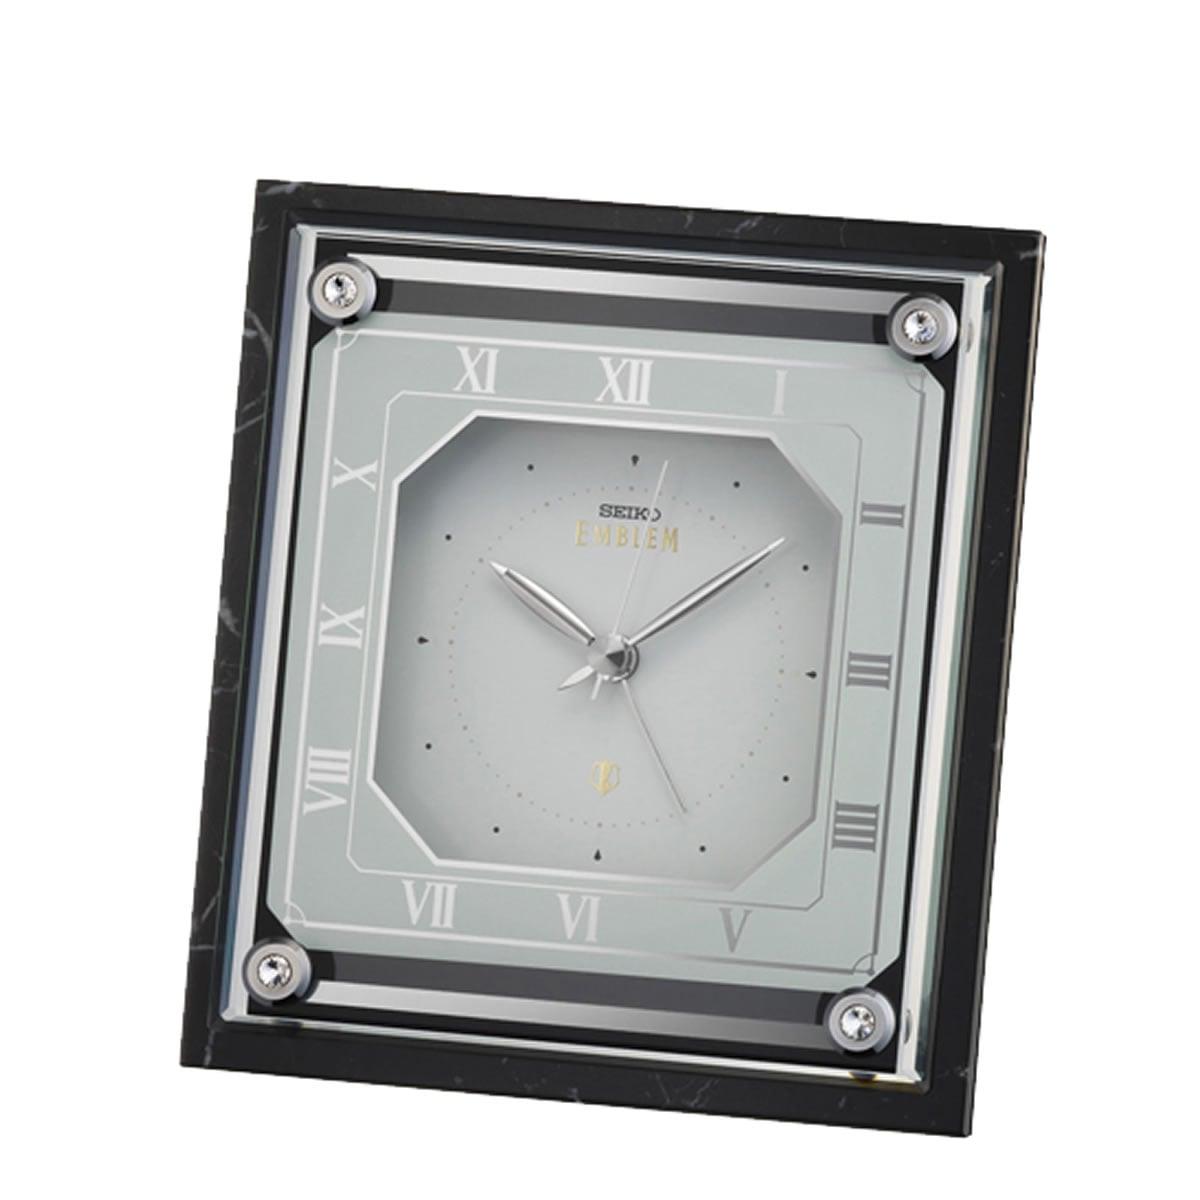 SEIKO EMBLEM(セイコー エムブレム)大理石枠 アラーム付き 置き時計 HR592K 黒